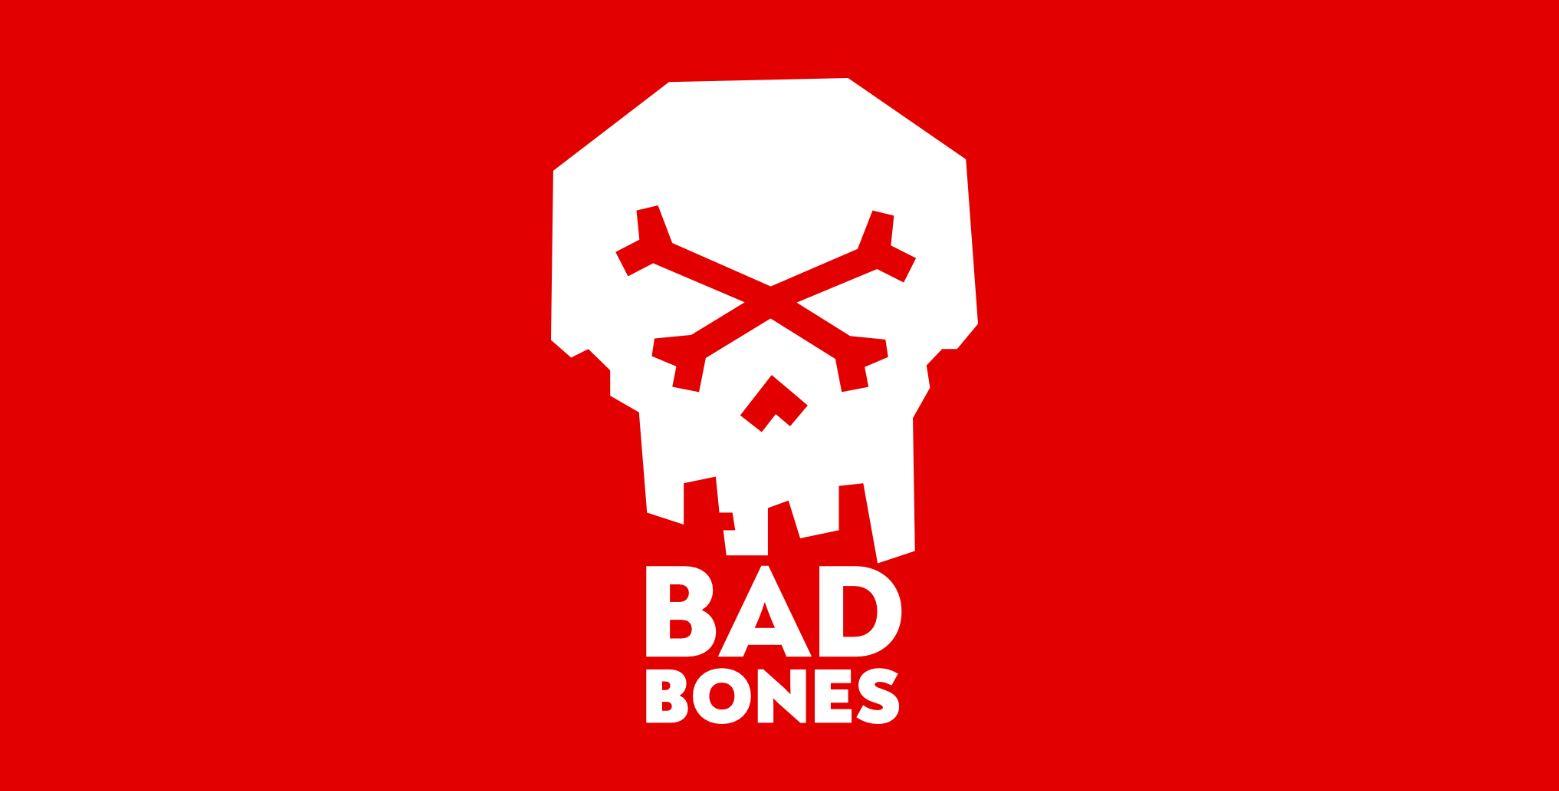 The mother company Bad Bones Games. Retro Bones is a subdivision of Bad Bones focused on creating VergeWorld.